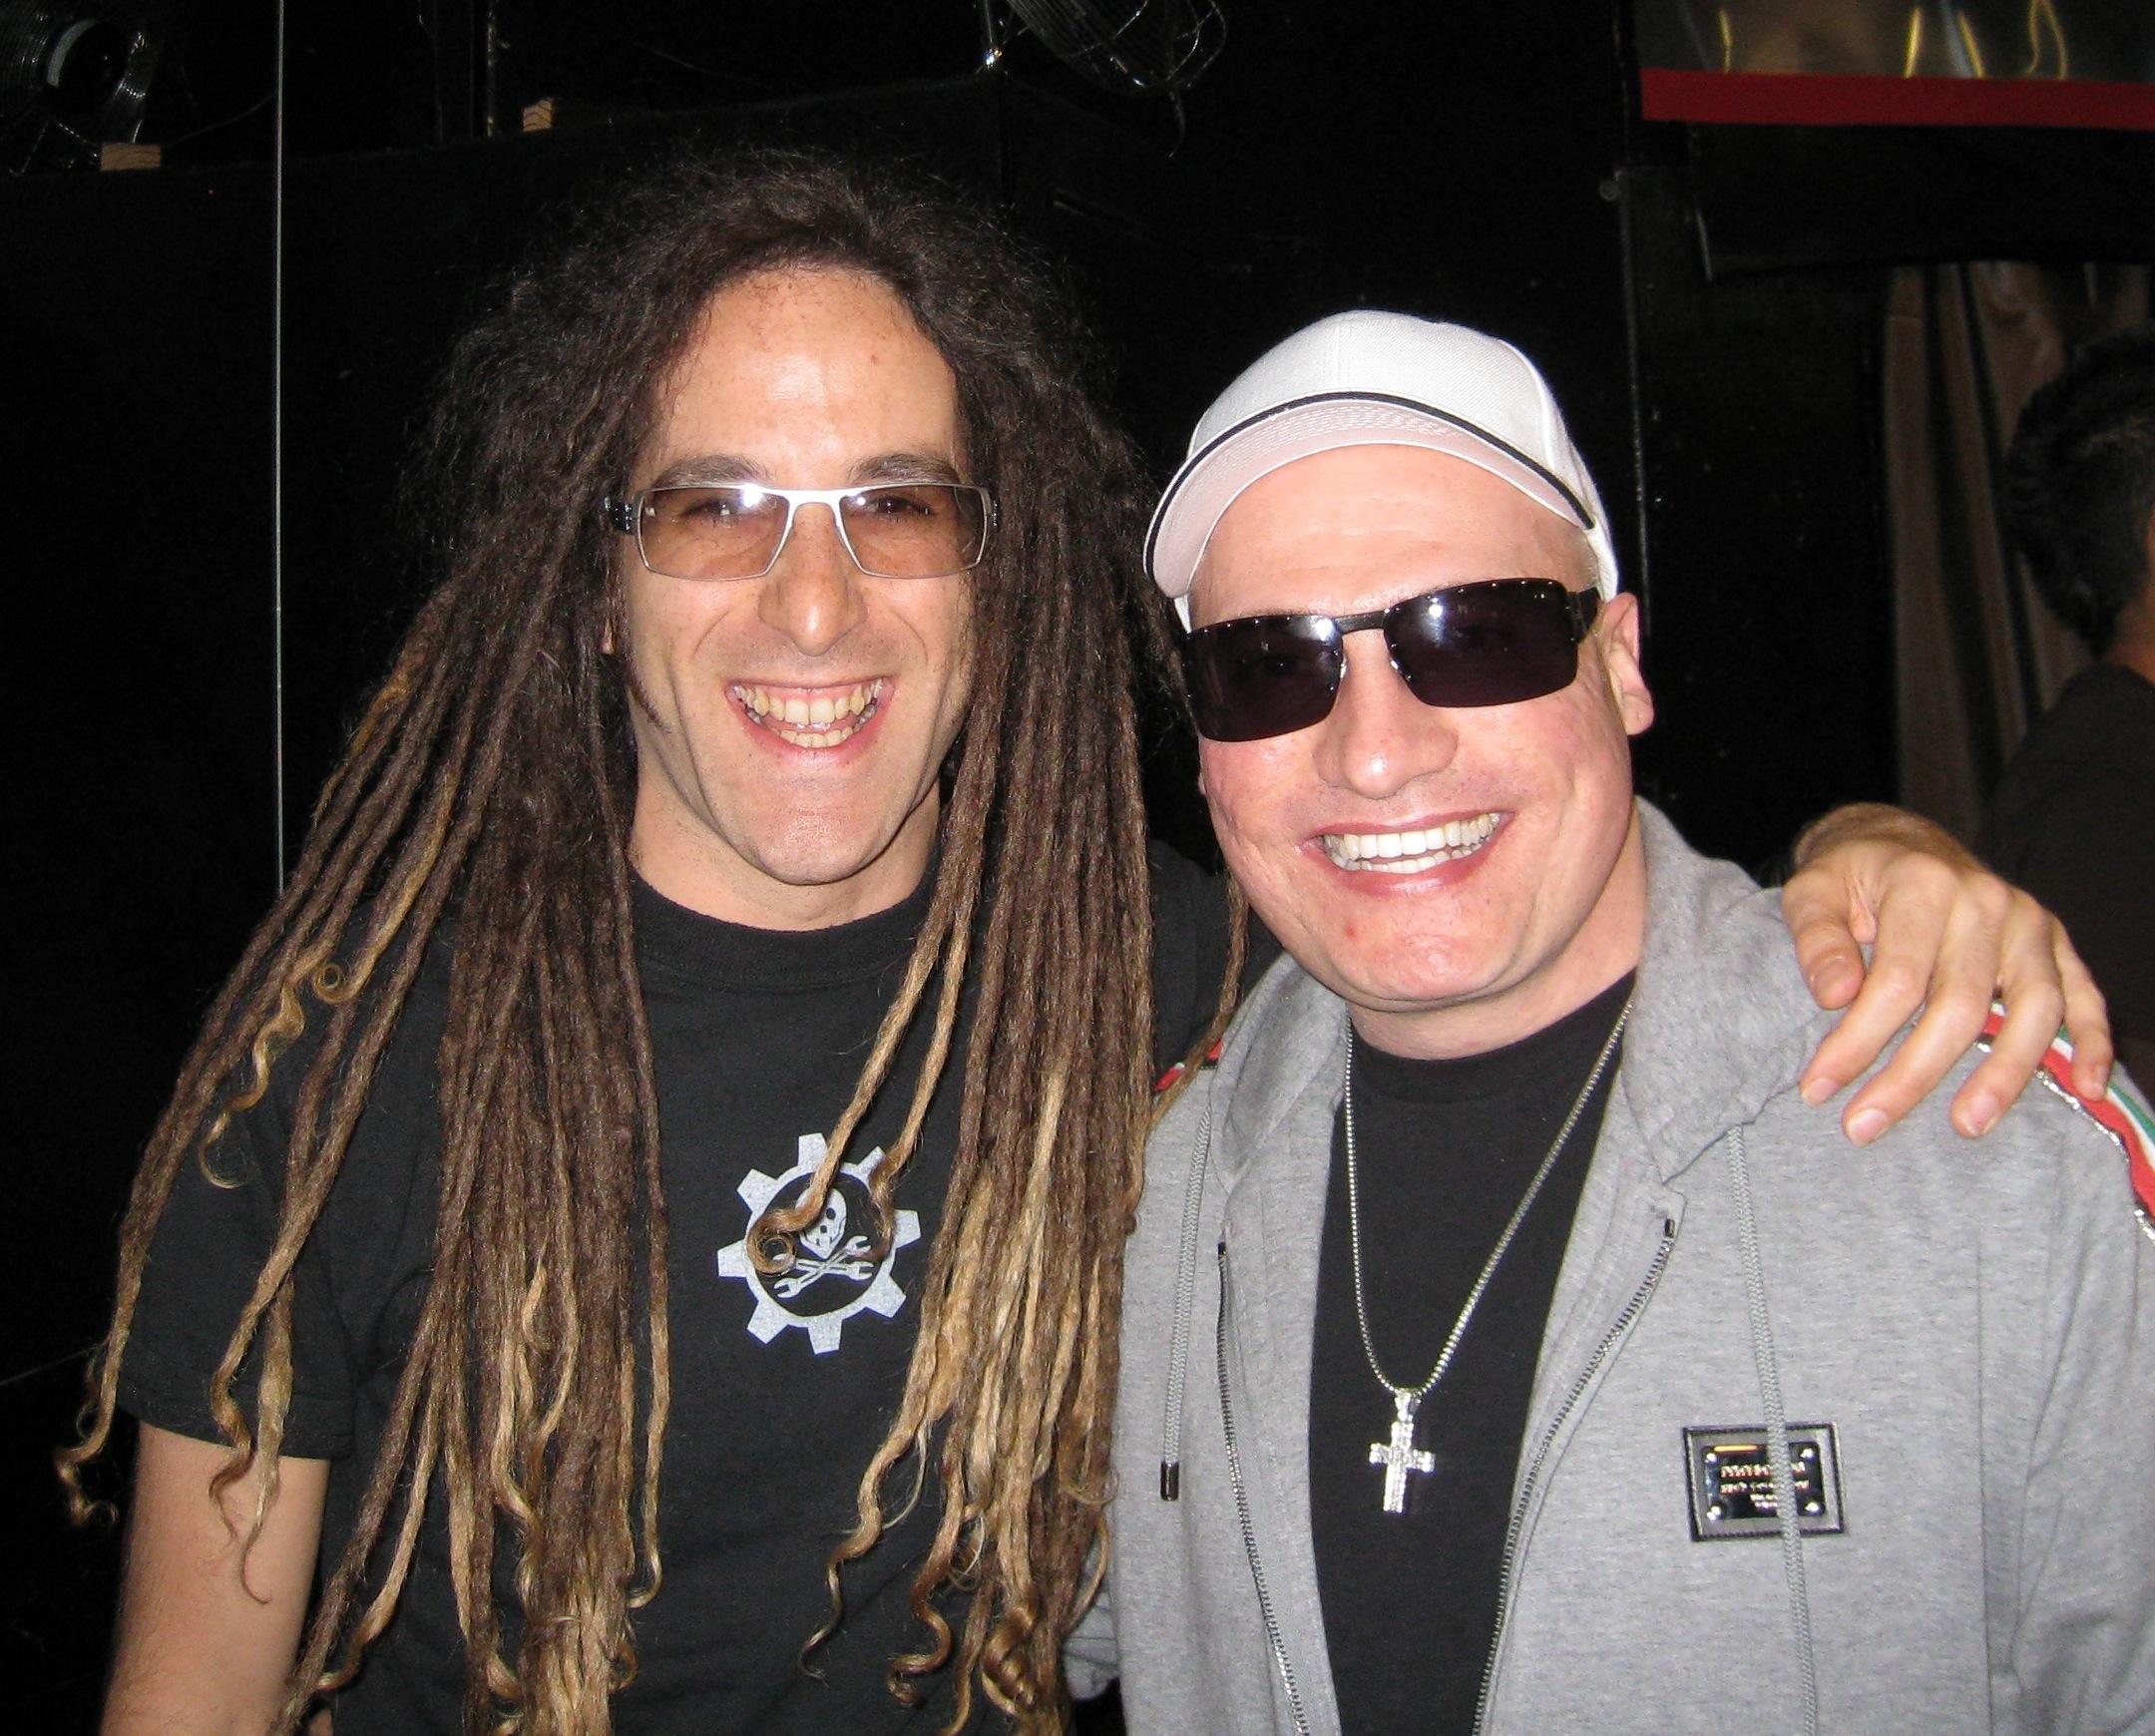 Danny Tenaglia & Dirtyhertz